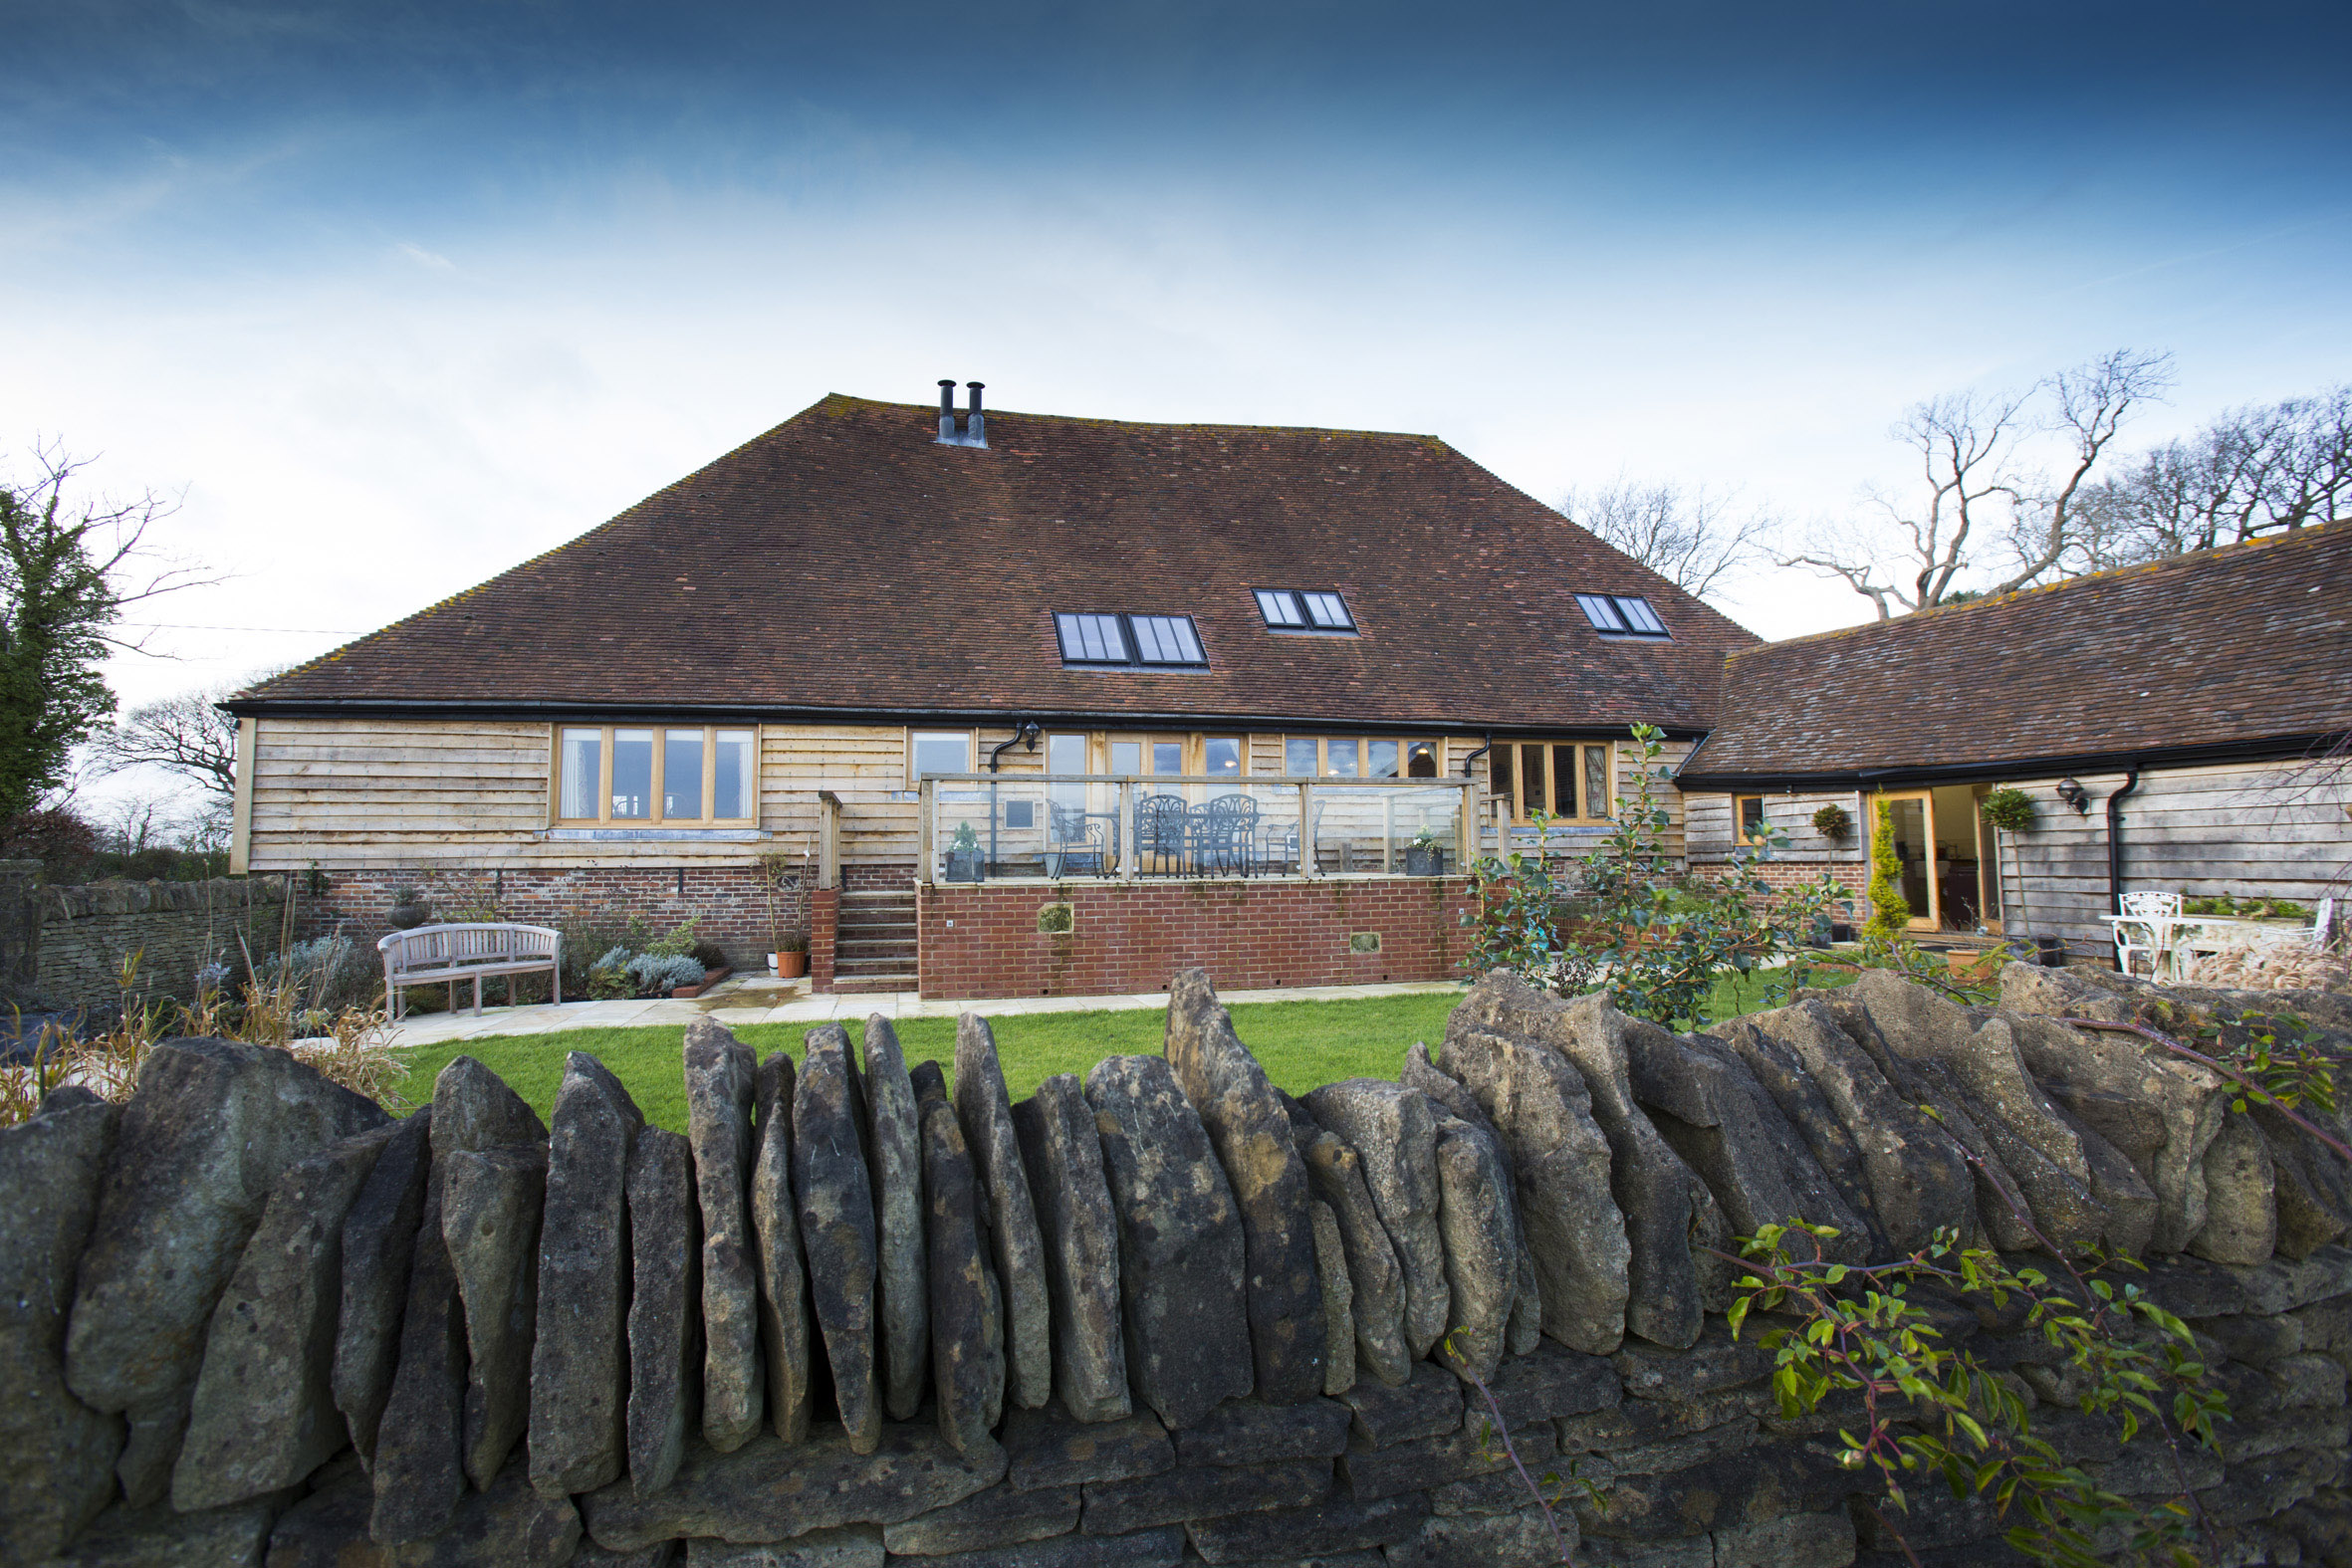 Iwood Barn, Rush Lake Green